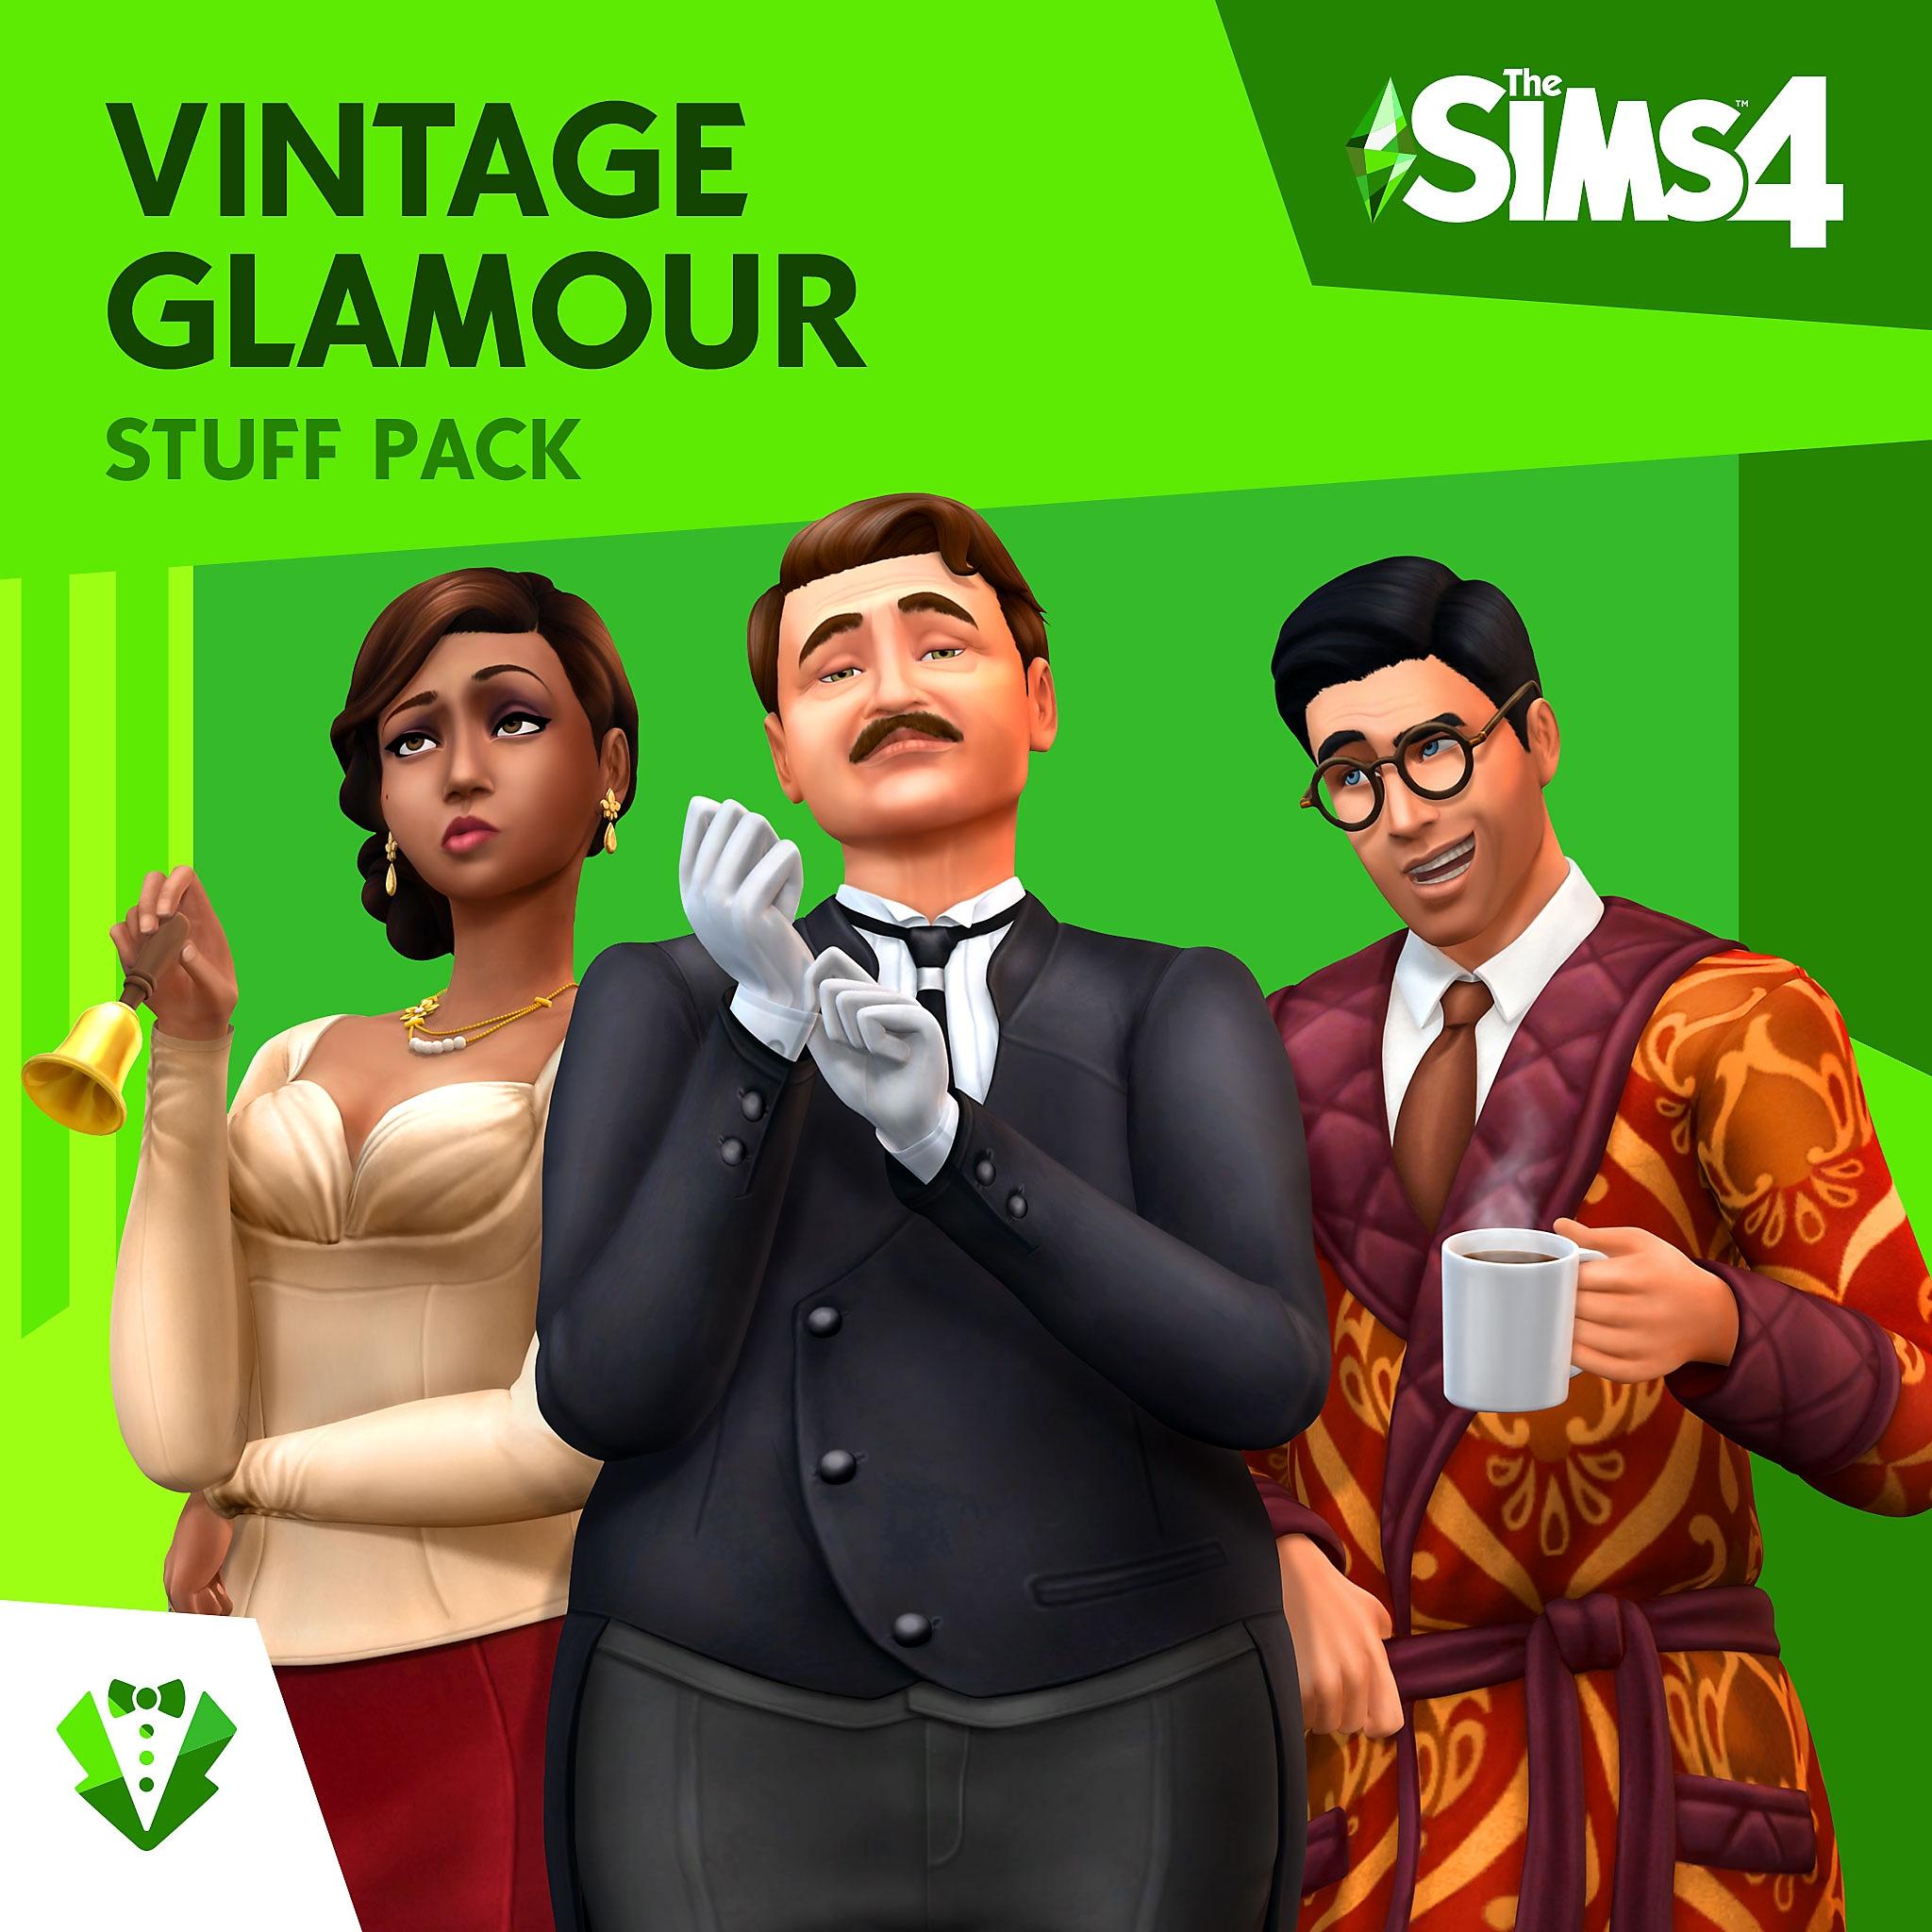 Vintage Glamour Stuff Pack